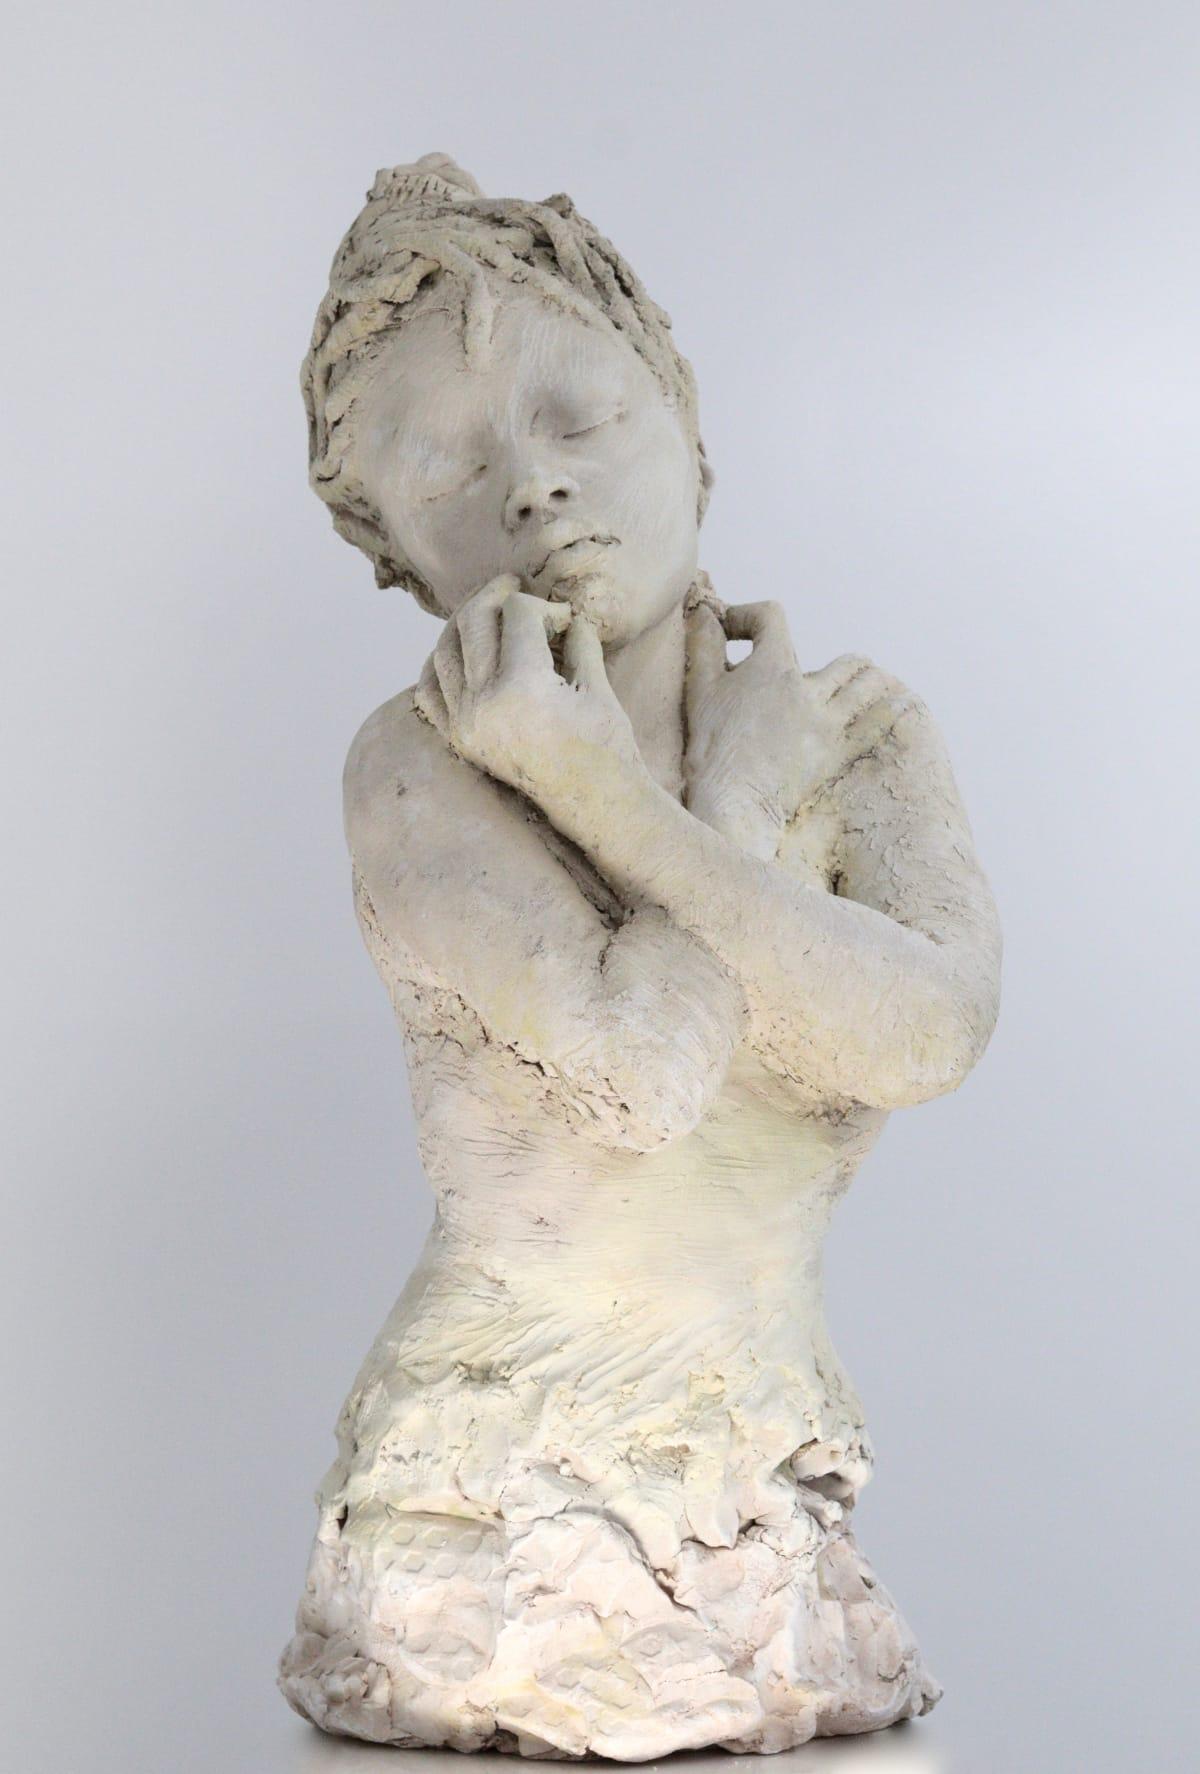 CHUKES Bag of Clay Ceramic 34 x 15 x 15